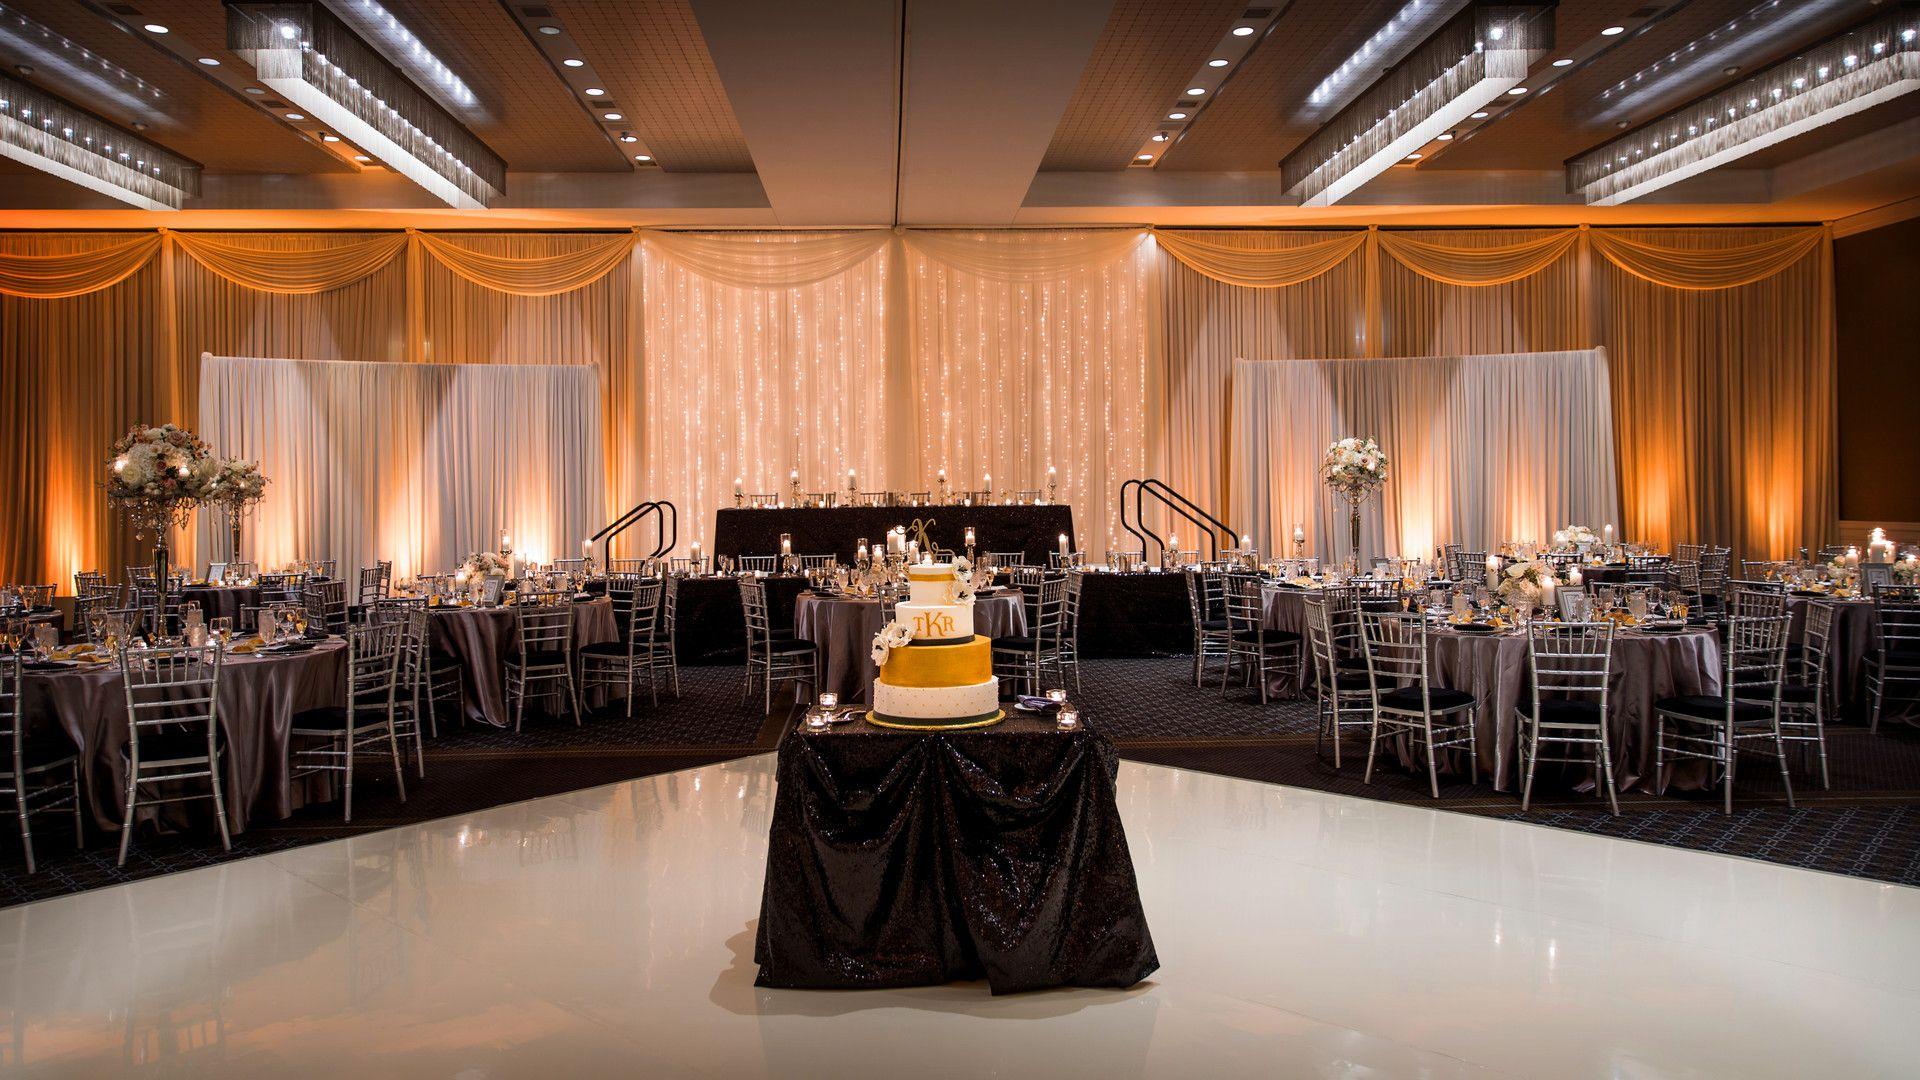 Luxurious Winter Wedding At Hotel Arista In Naperville Il Captured By Jason Kaczorowski Wedding Reception Decorations Winter Wedding Wedding Decor Inspiration